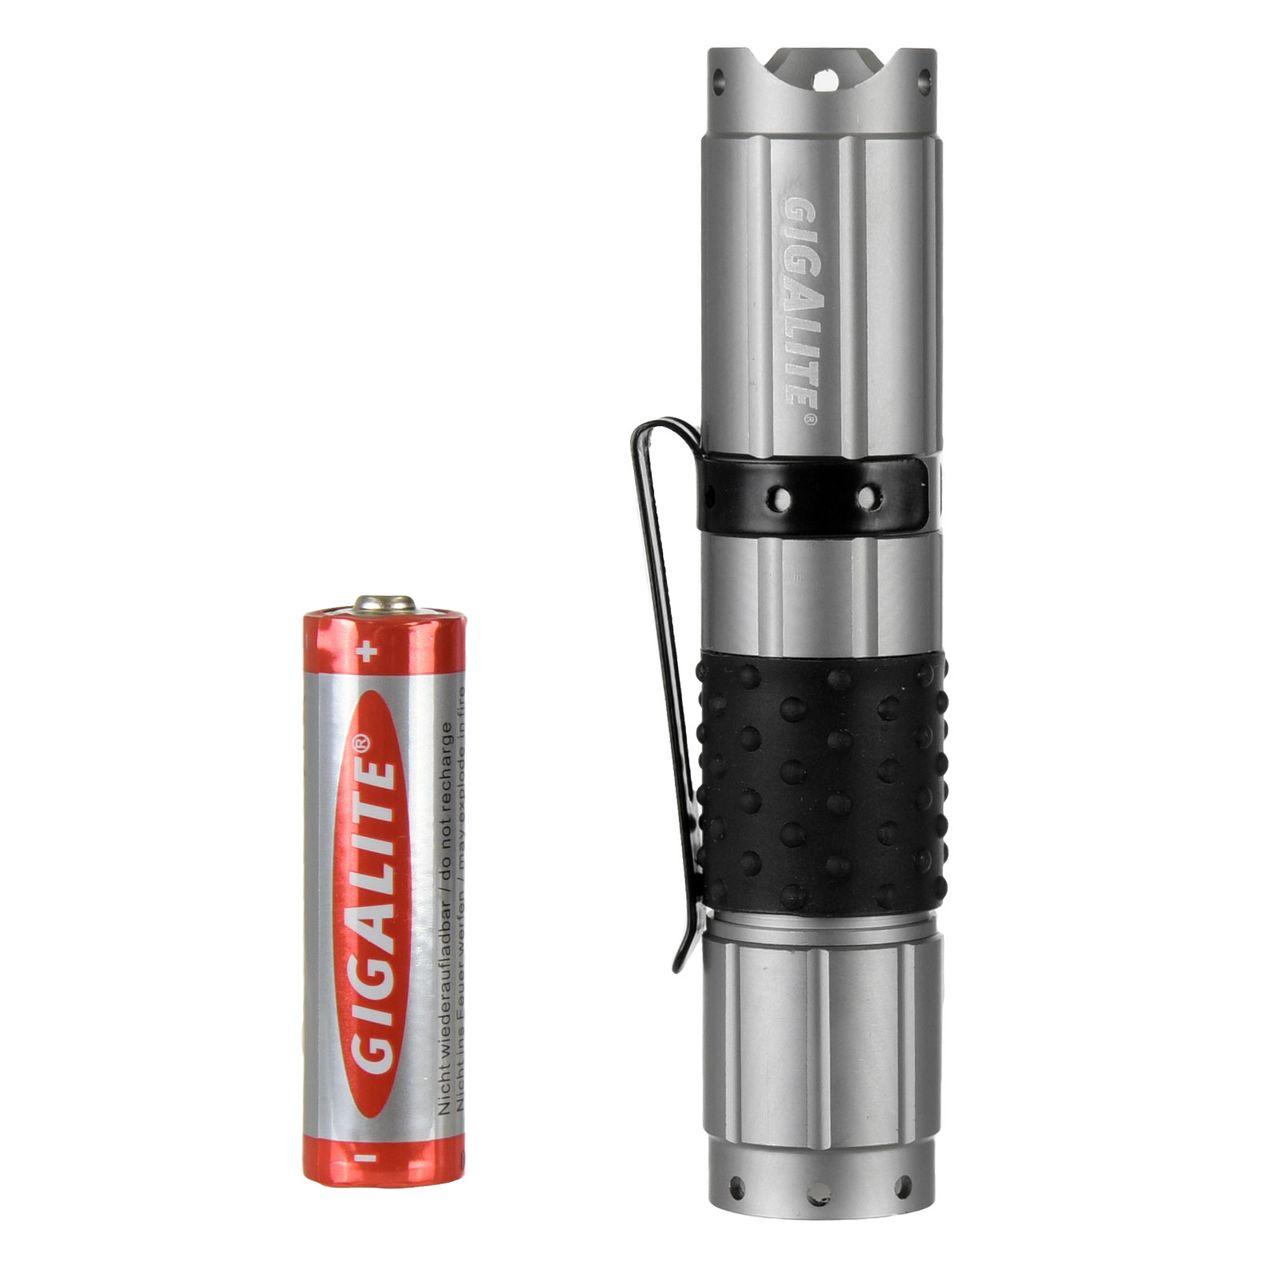 GIGALITE LED Micro Batterielampe Reichweite: 15 m